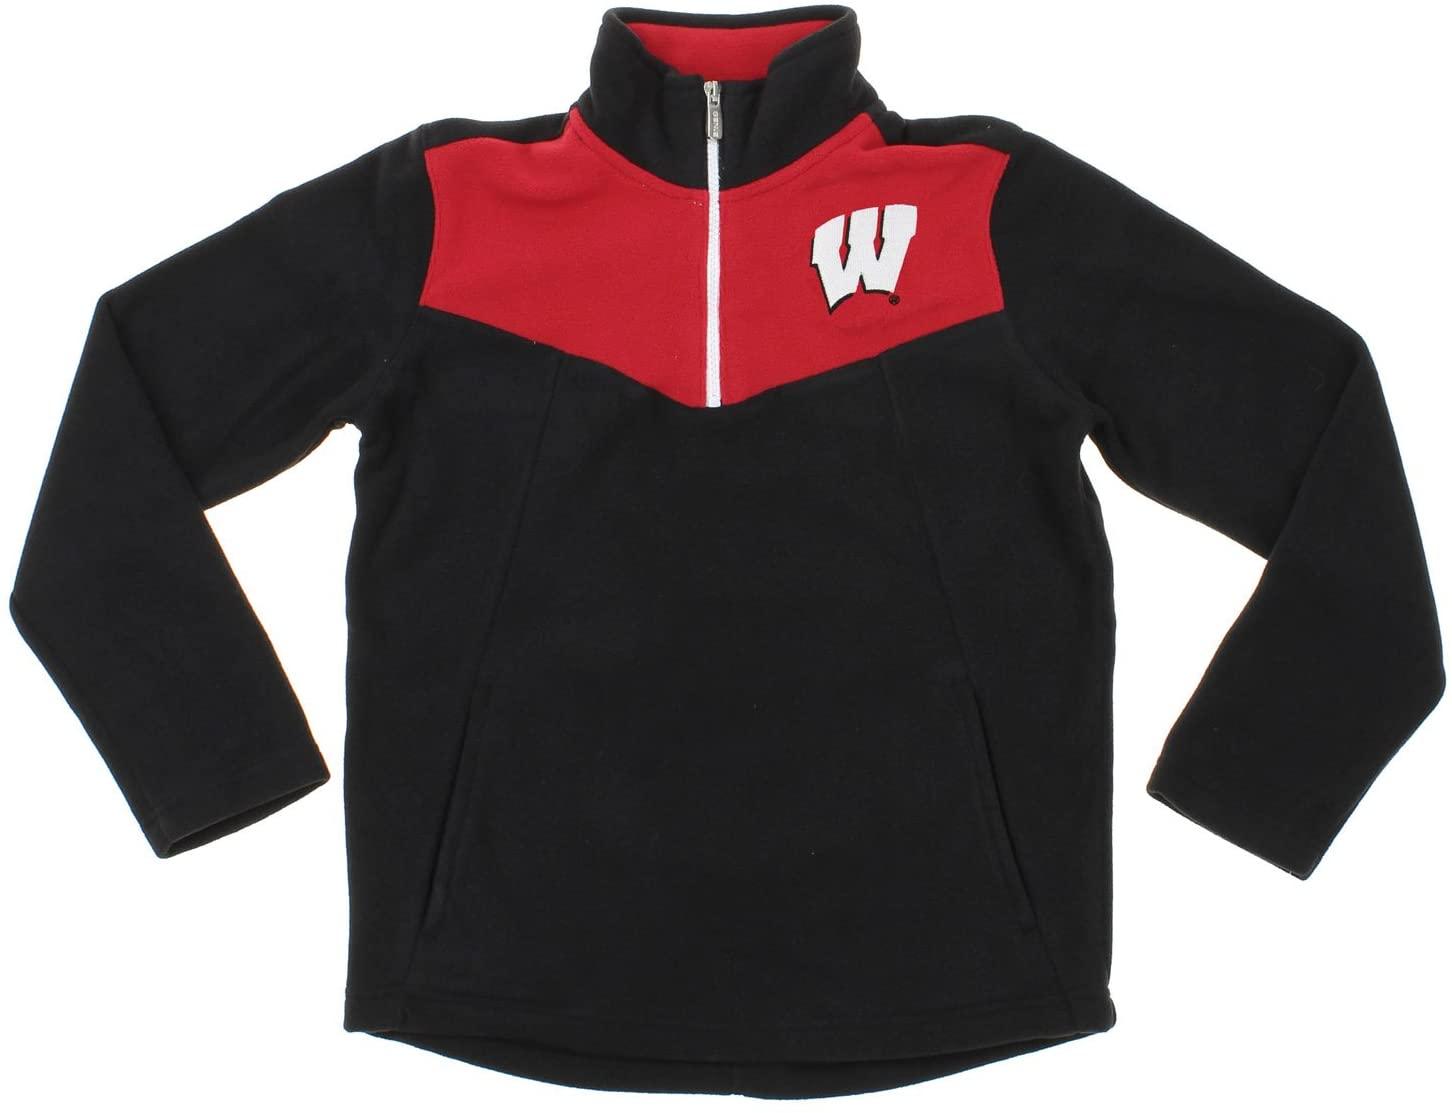 Gen2 Wisconsin Badgers NCAA Youth Boys Break Point 1/4 Zip Pullover Sweater, Black